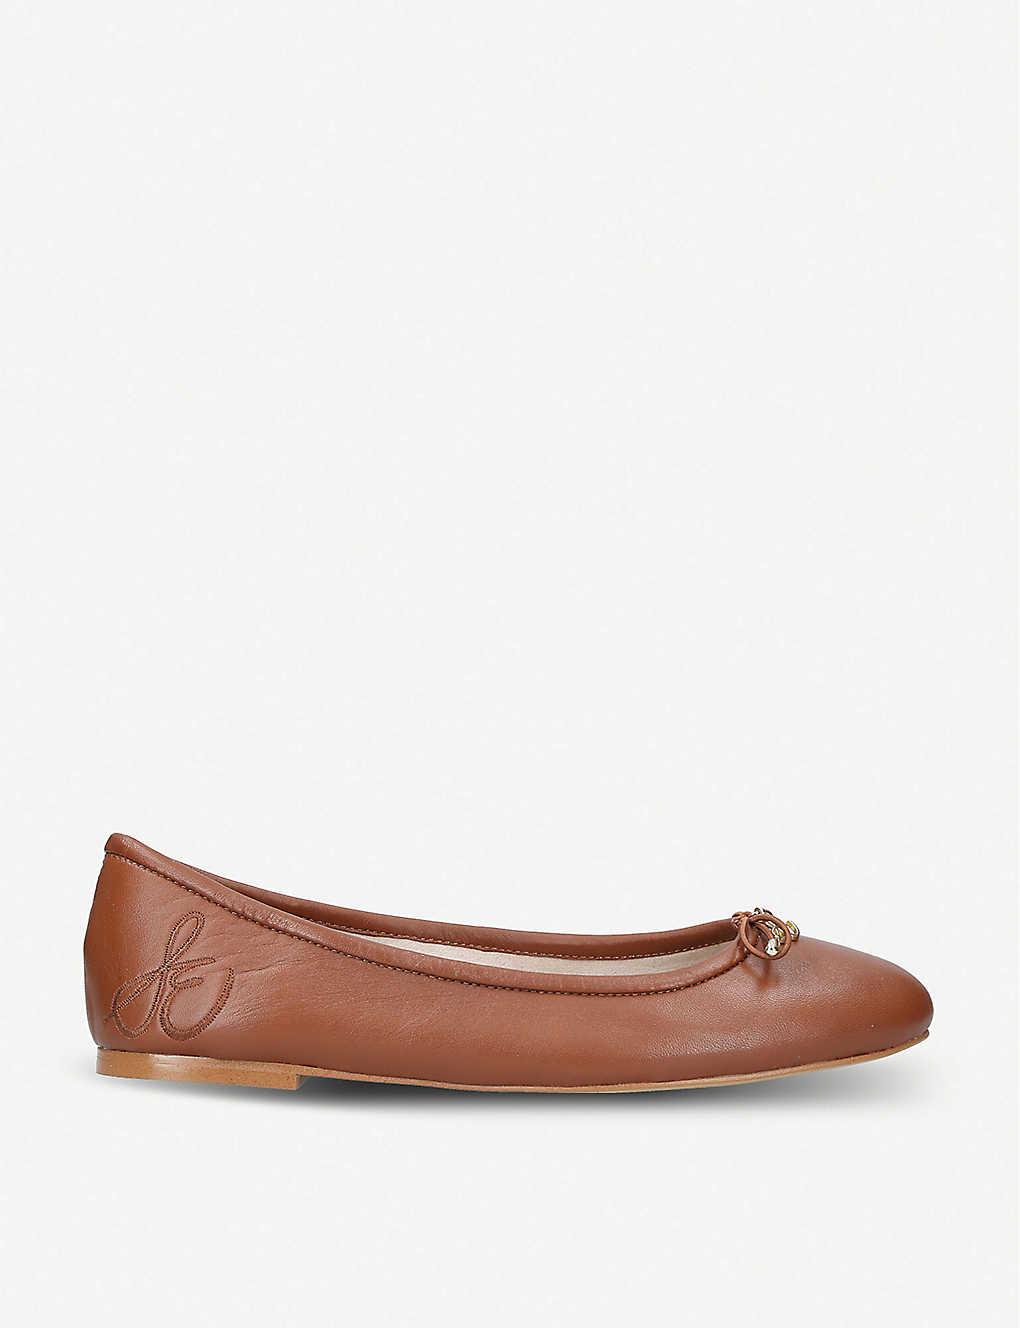 4b3d4c06518c SAM EDELMAN - Felicia leather ballet flats | Selfridges.com